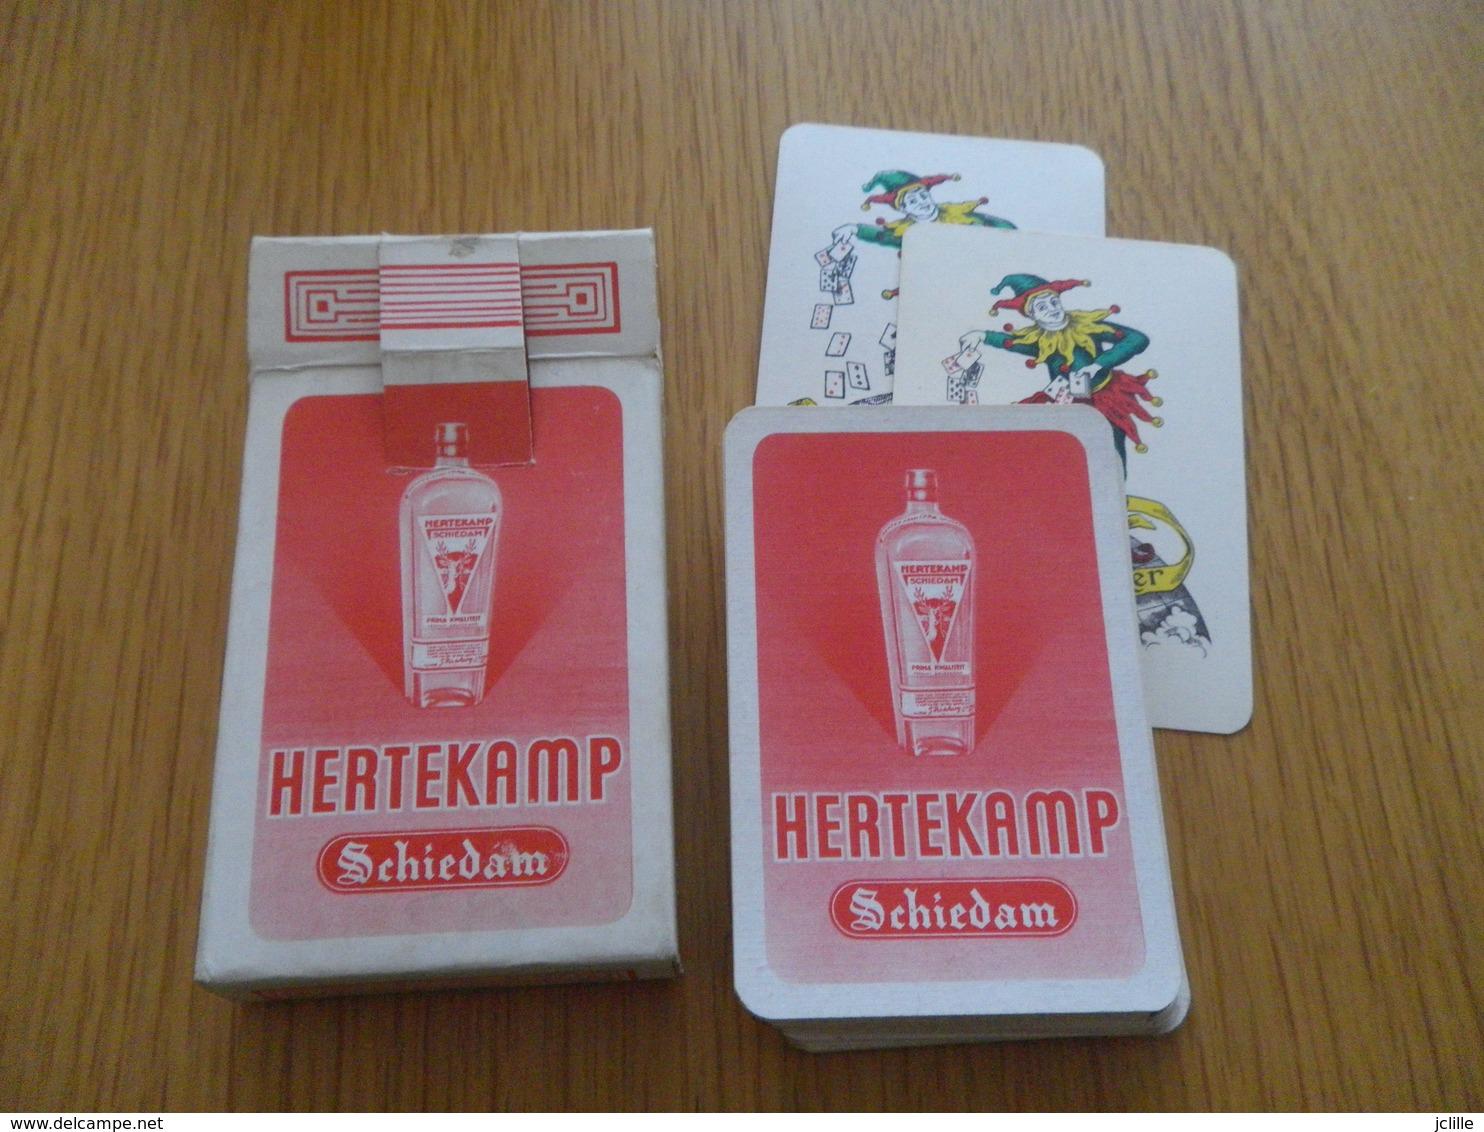 Jeu De 54 Cartes à Jouer - Liqueur HERTEKAMP SCHIEDAM - 54 Cartes